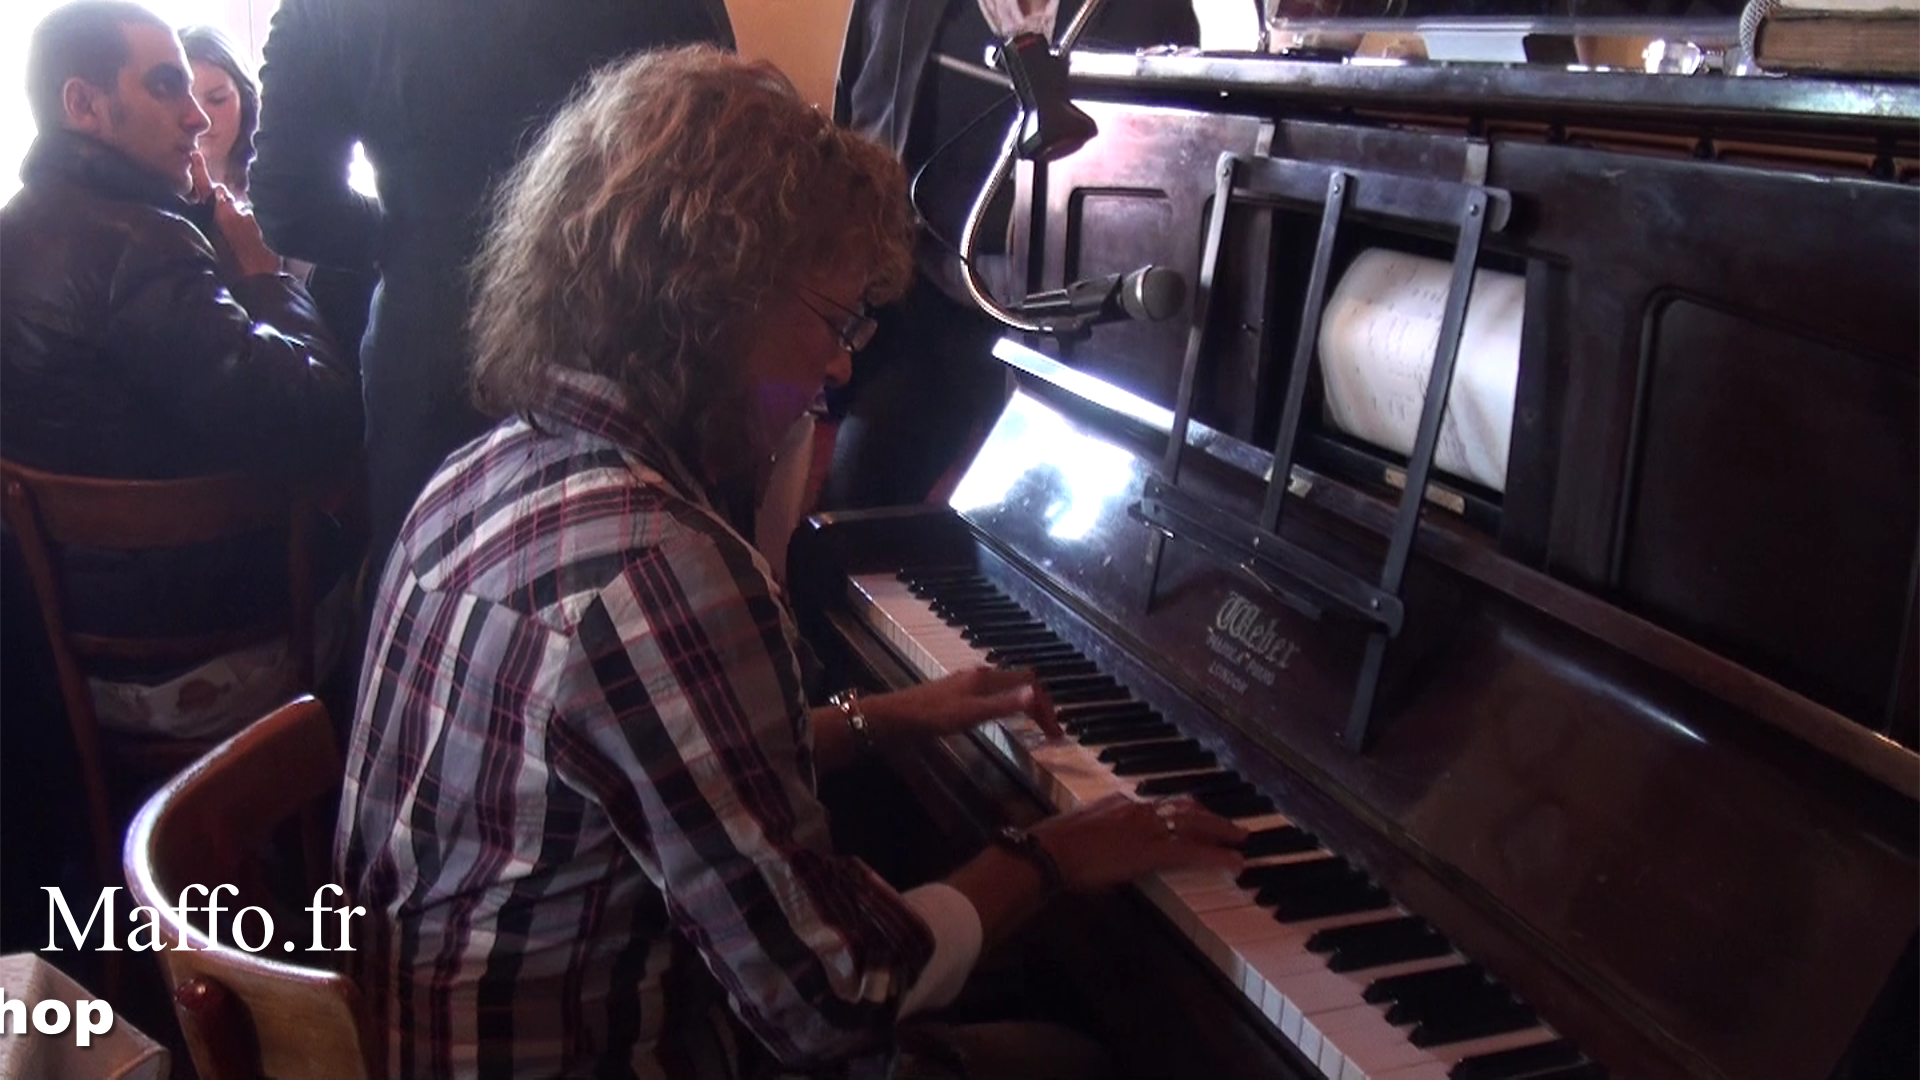 Nadine au Piano Concert Nadine N°127, By Maffo.fr